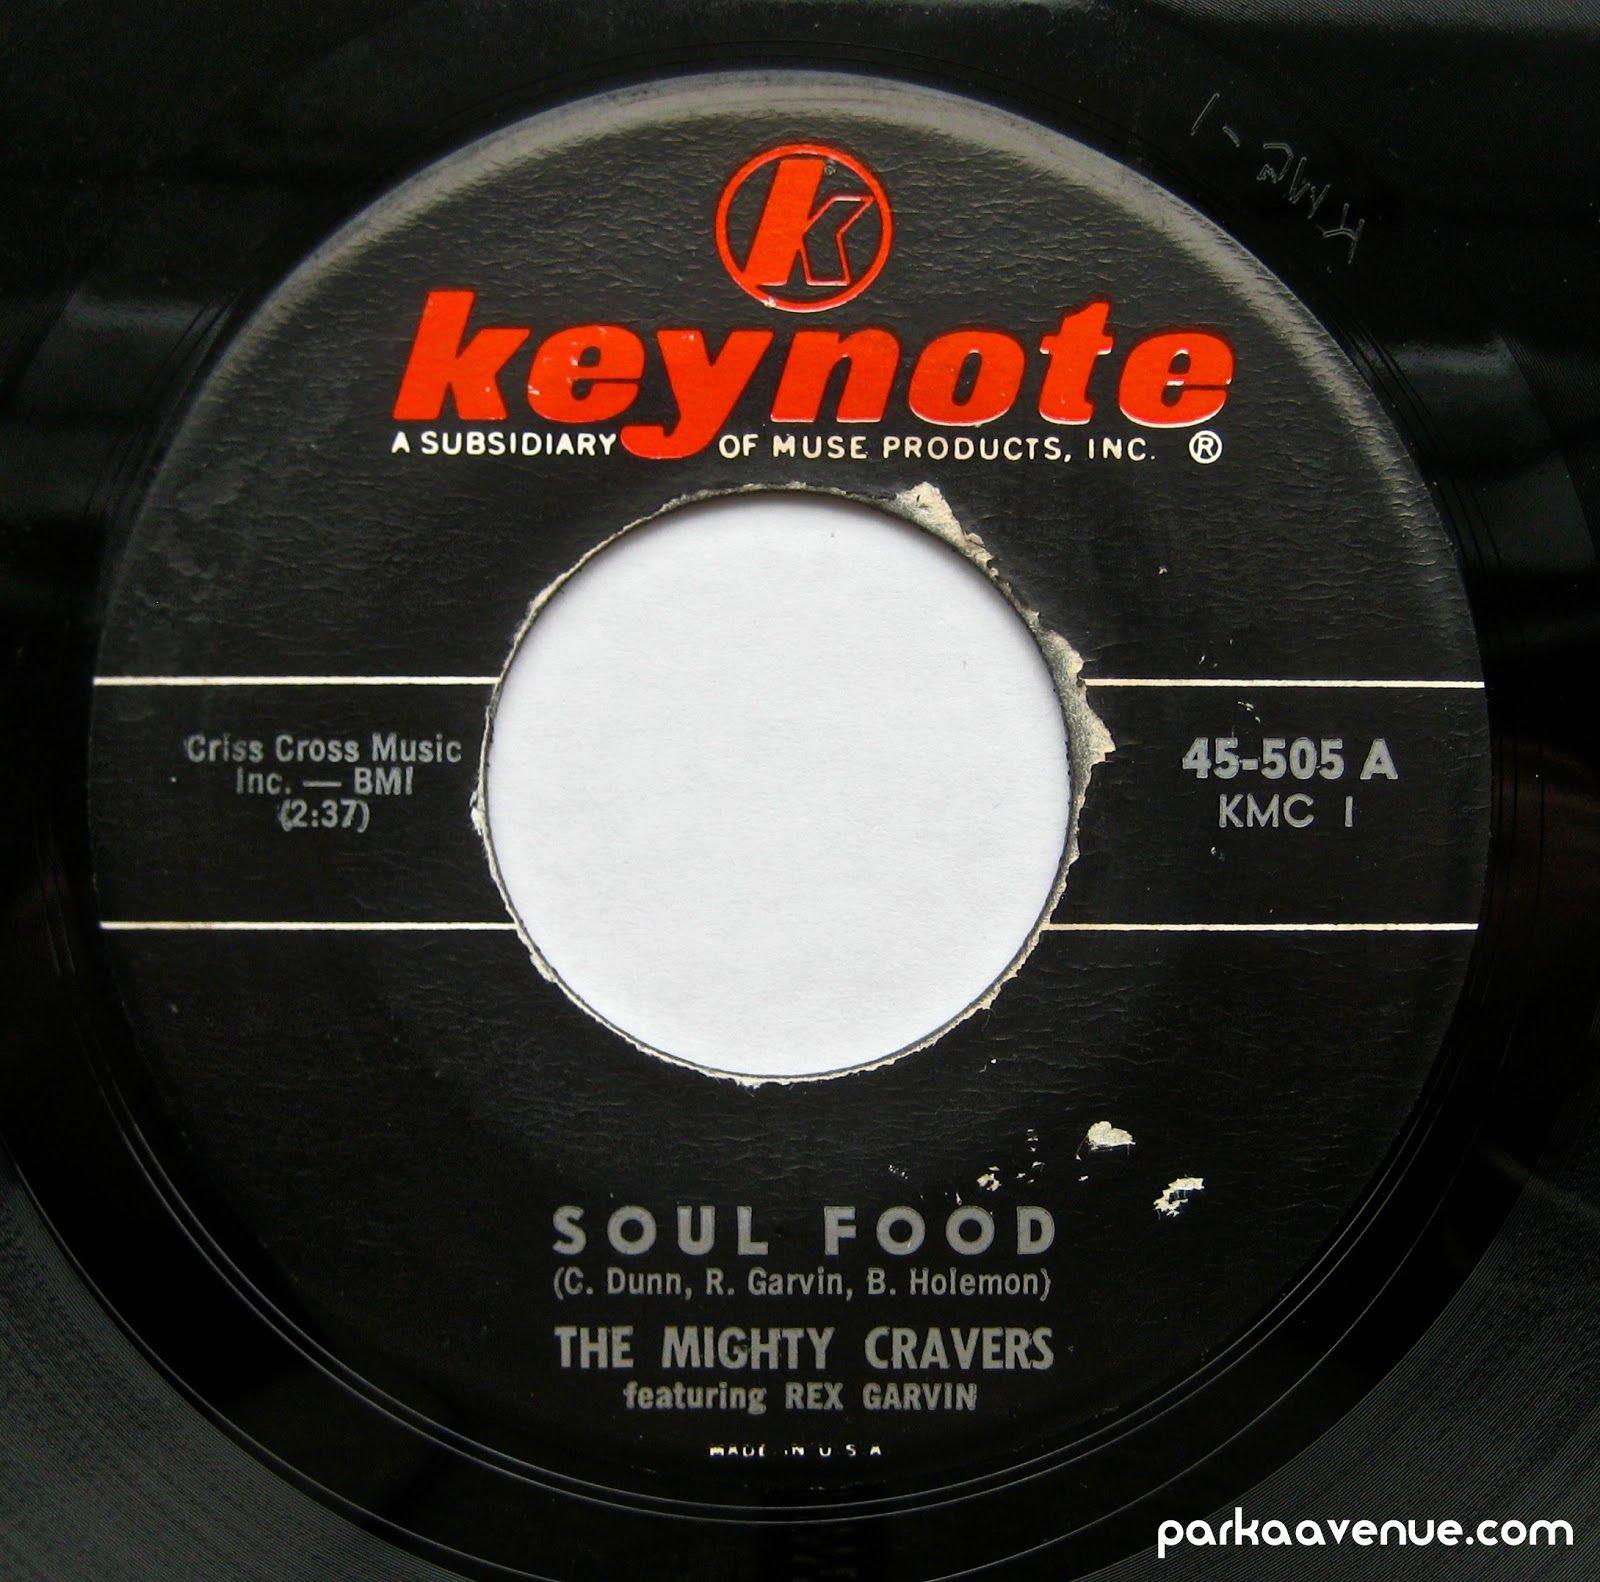 Keynote Records